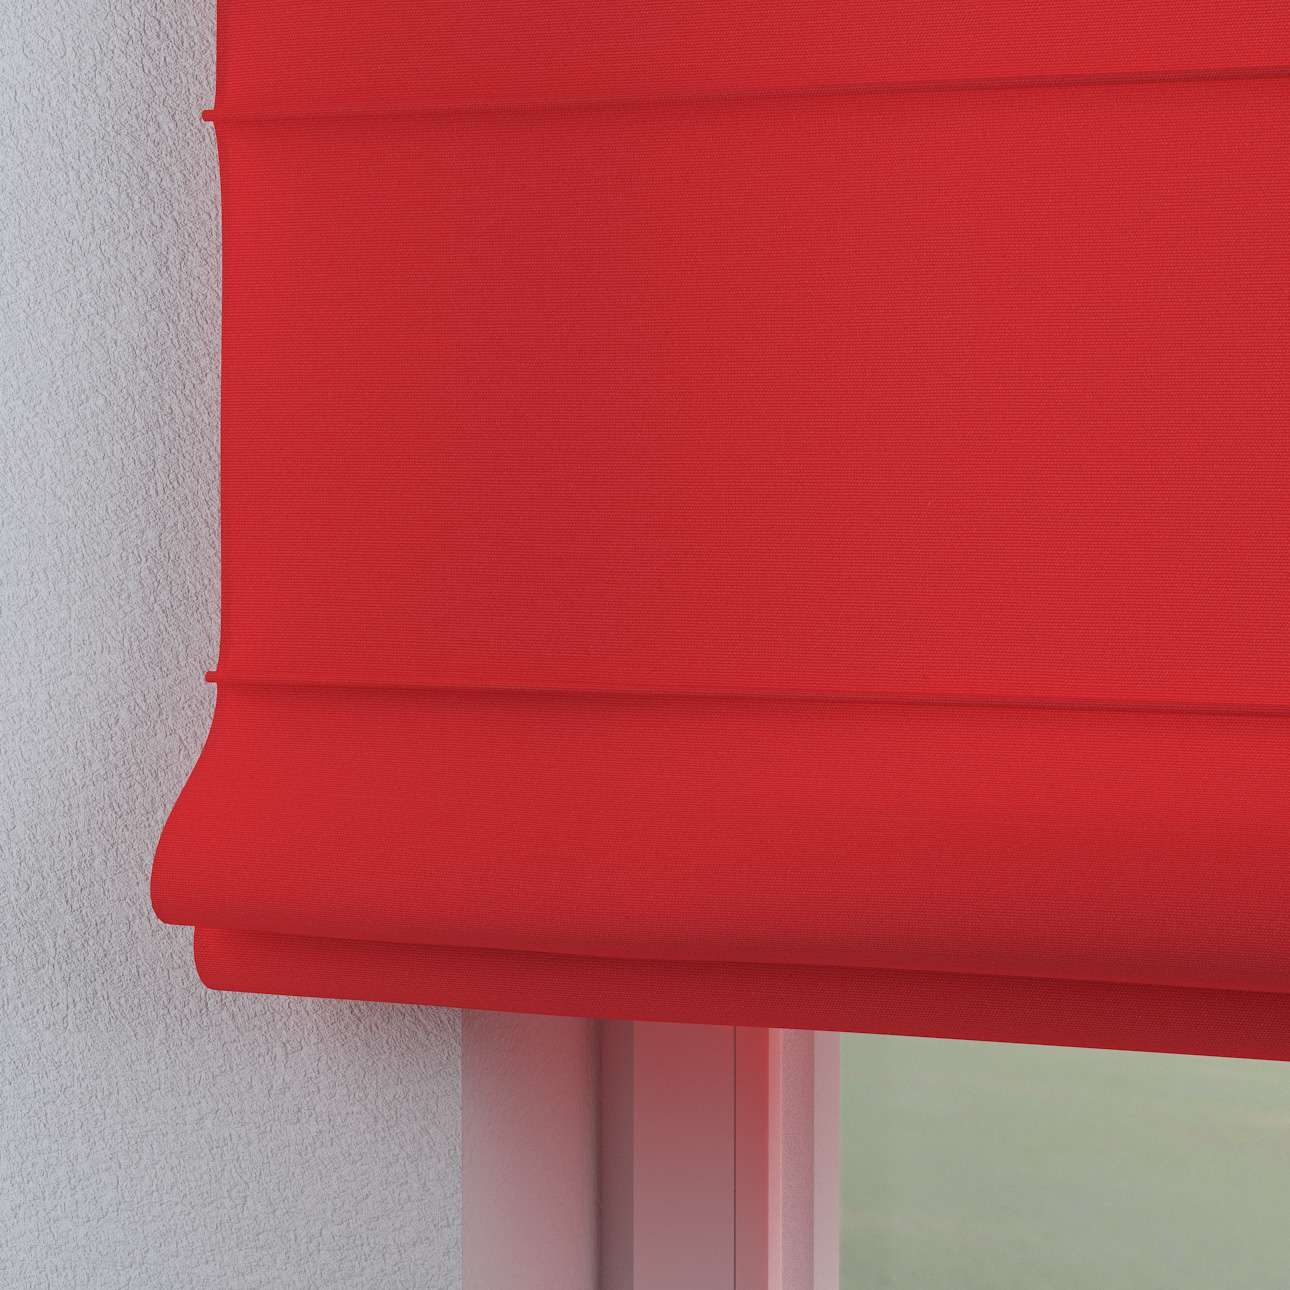 Foldegardin Capri<br/>Uden flæsekant 80 x 170 cm fra kollektionen Loneta, Stof: 133-43